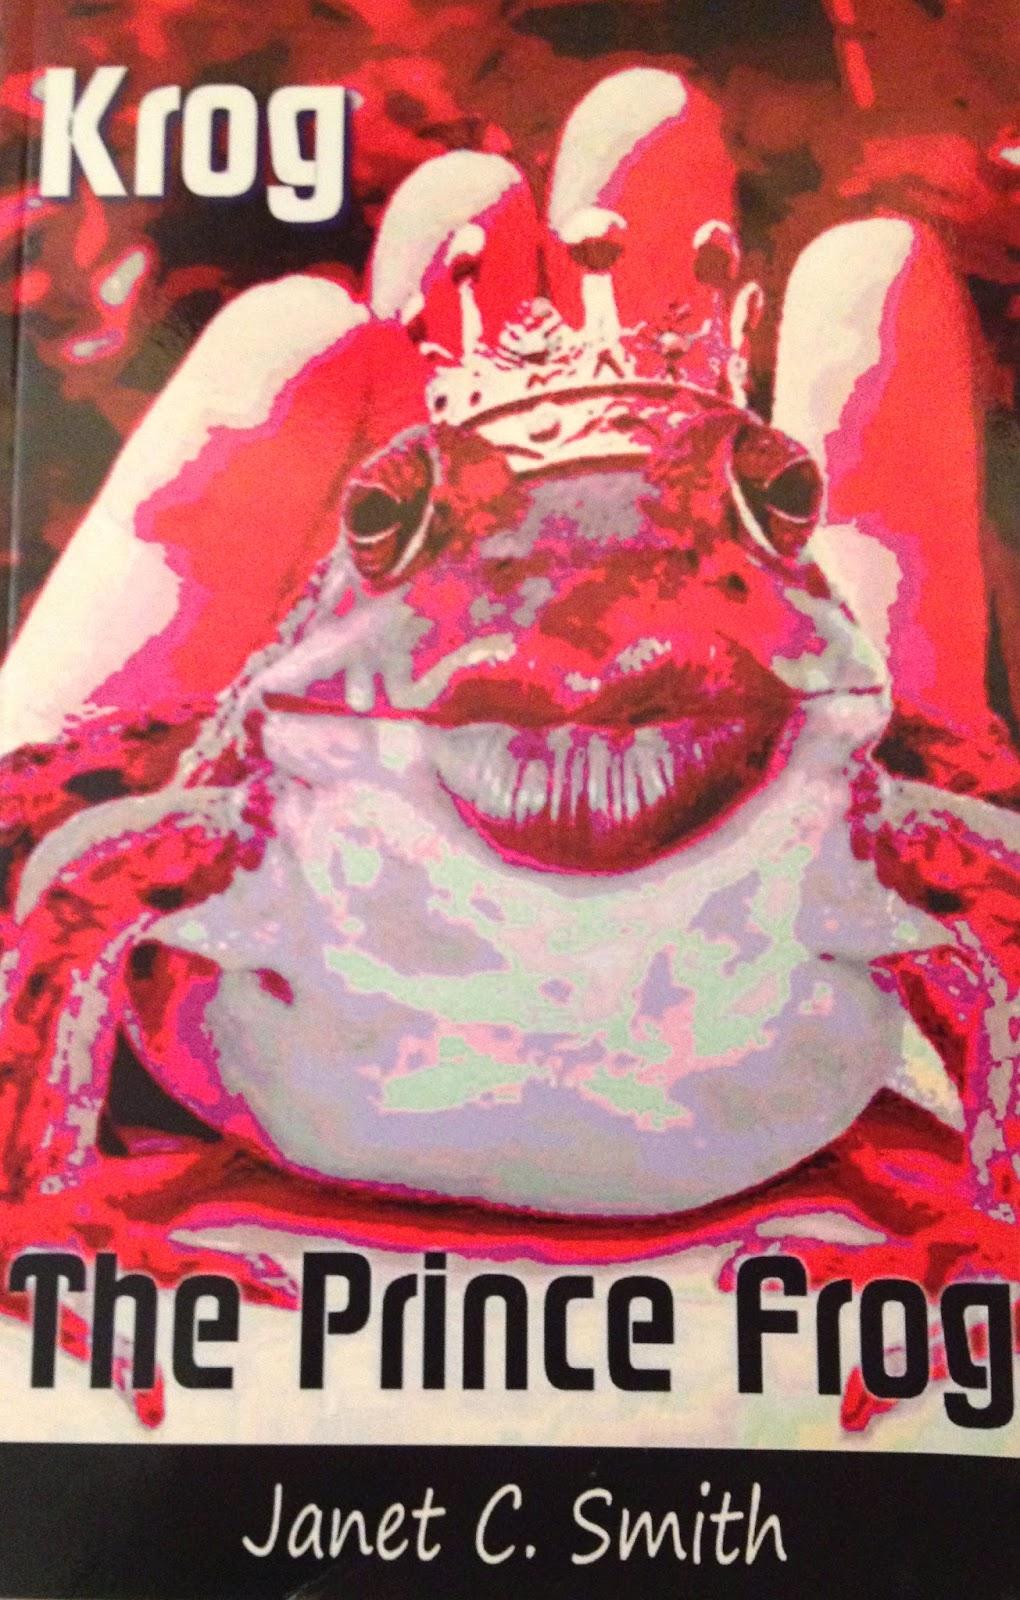 krog the frog prince